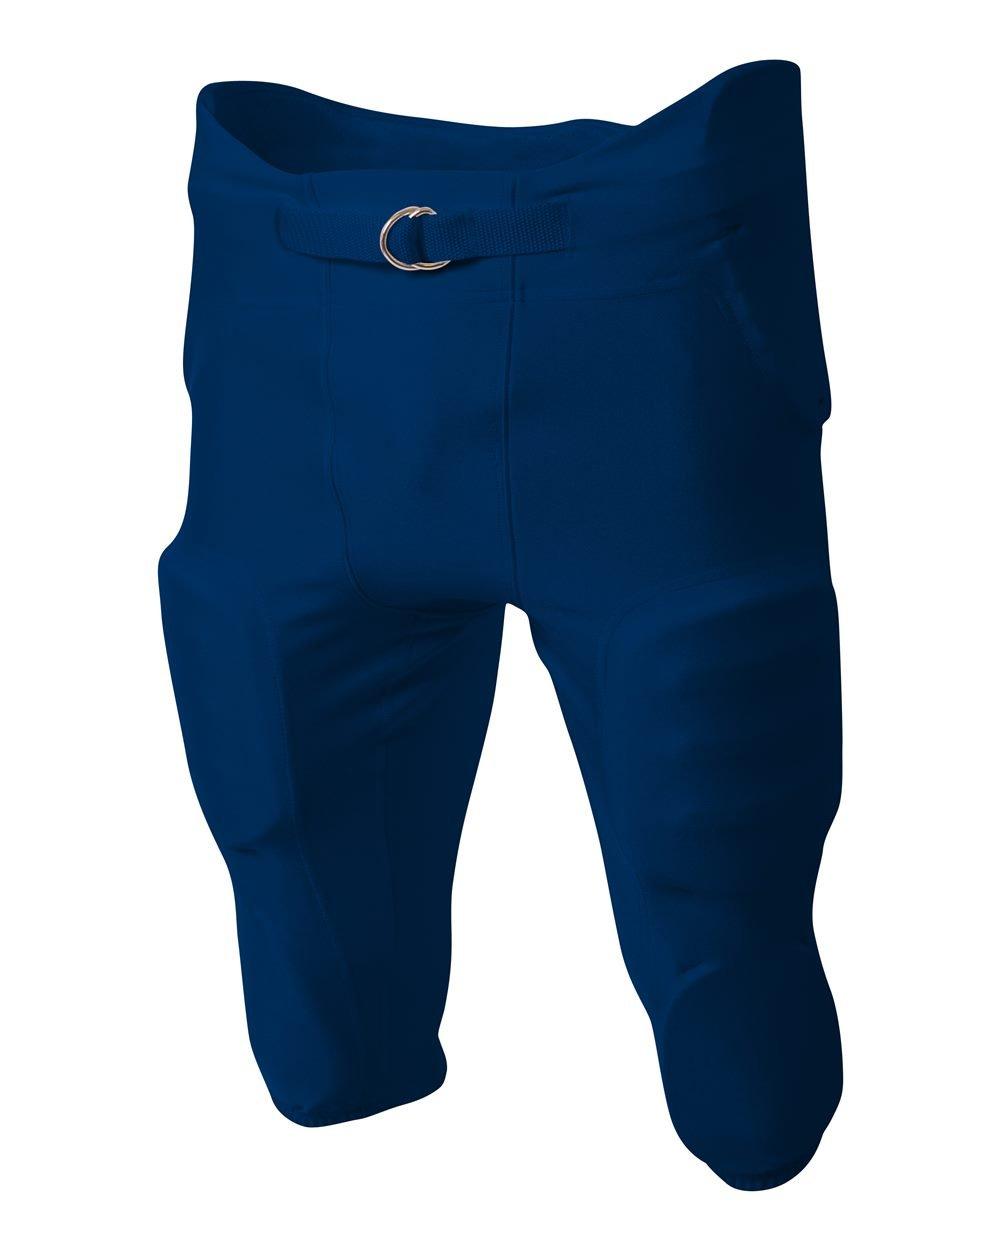 A4 Sportswear フットボールパンツ ハイエンド 吸湿 4方向ストレッチ 一体型 7パッドヒップ、膝、太もも&尻尾パッド Dリングベルト付き (7色/7サイズ) ネイビーブルー X-Large